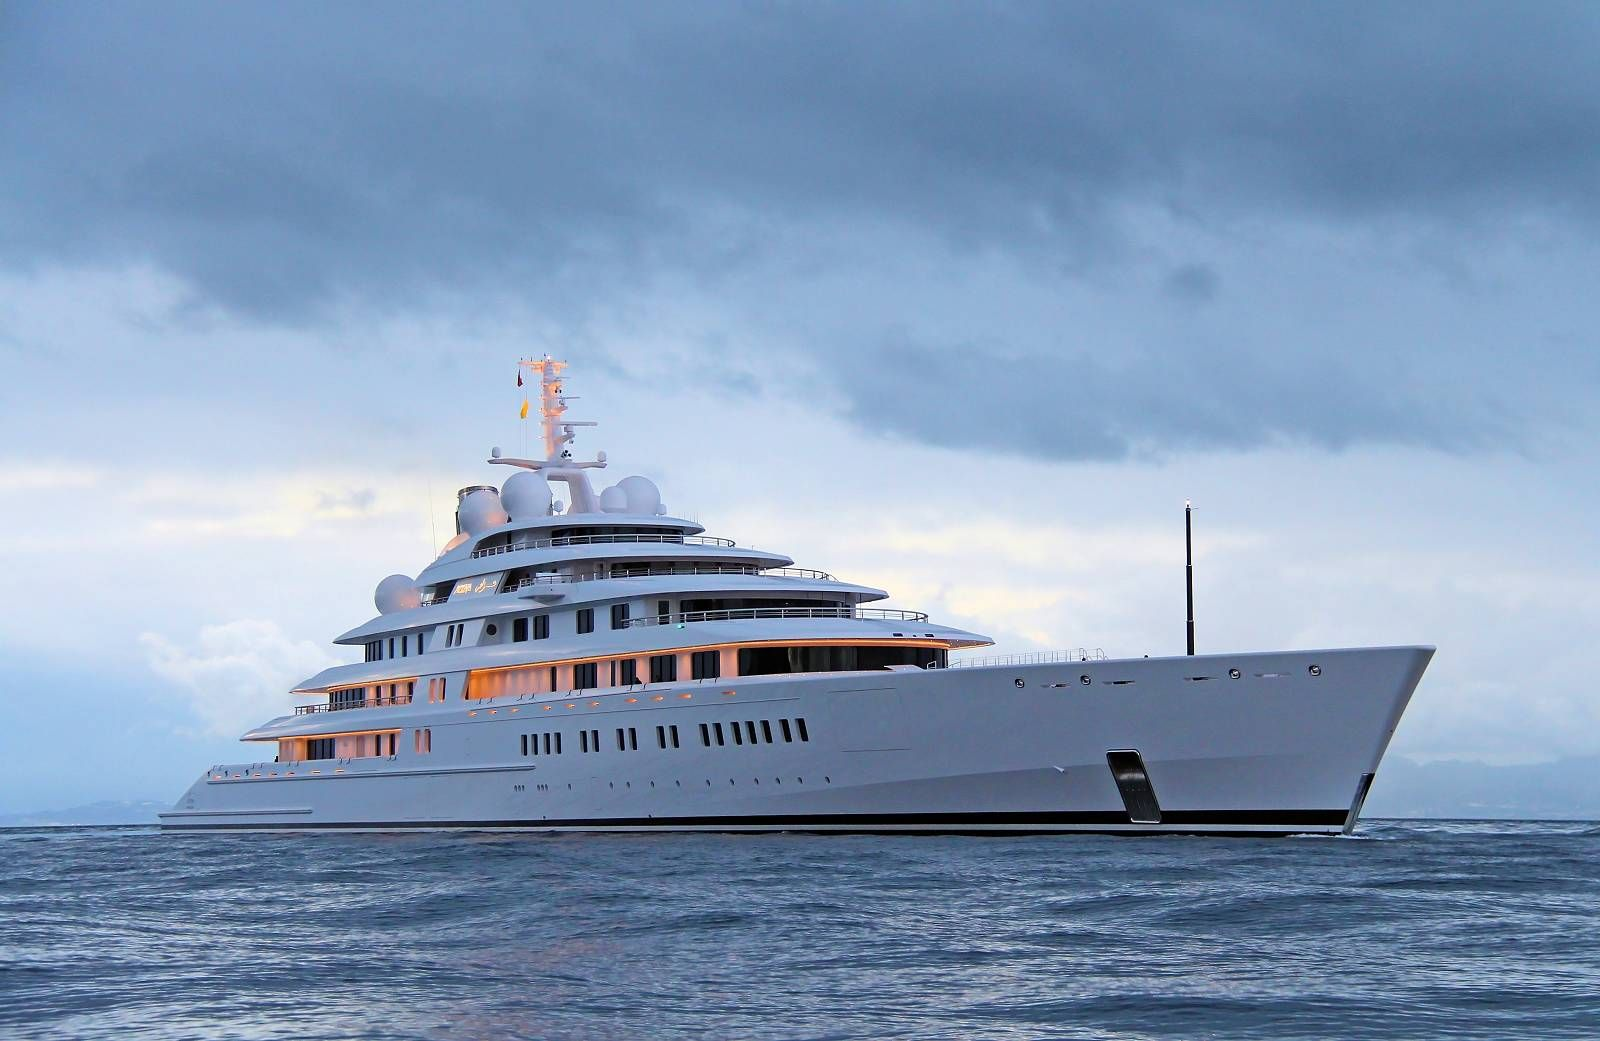 180m Lurssen Mega Yacht Azzam Designed By Nauta Photo By